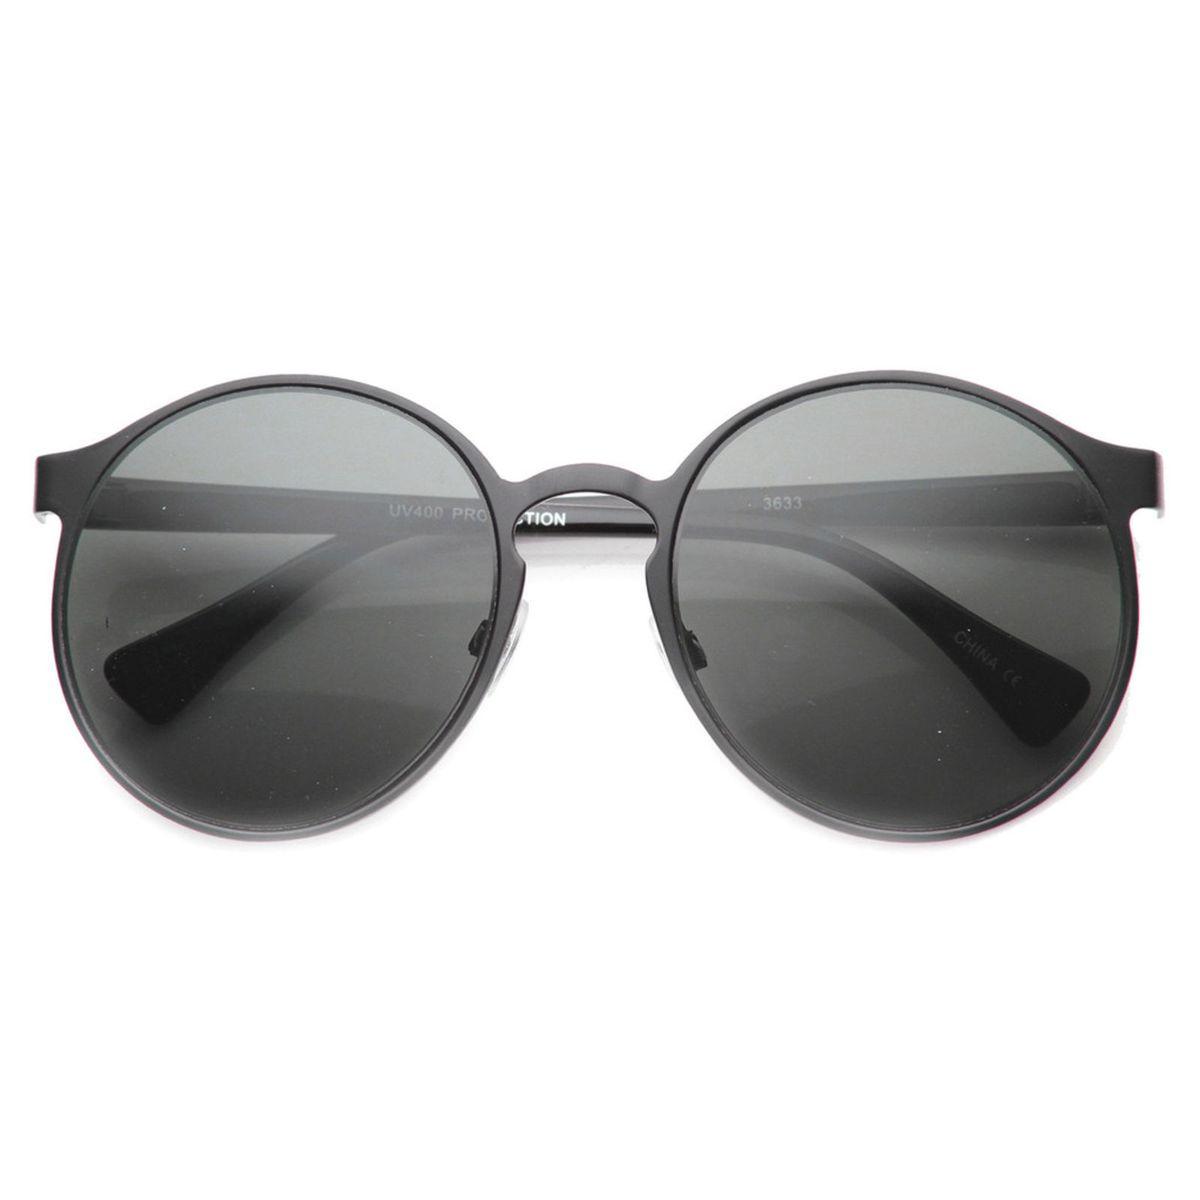 óculos redondo oversize metal - óculos sem marca.  Czm6ly9wag90b3muzw5qb2vplmnvbs5ici9wcm9kdwn0cy8zotuwnzuvmdjimzqzywnmntjhn2nhodu4ndkxyjjknzg4nwrhoweuanbn  ... ab4de79f74